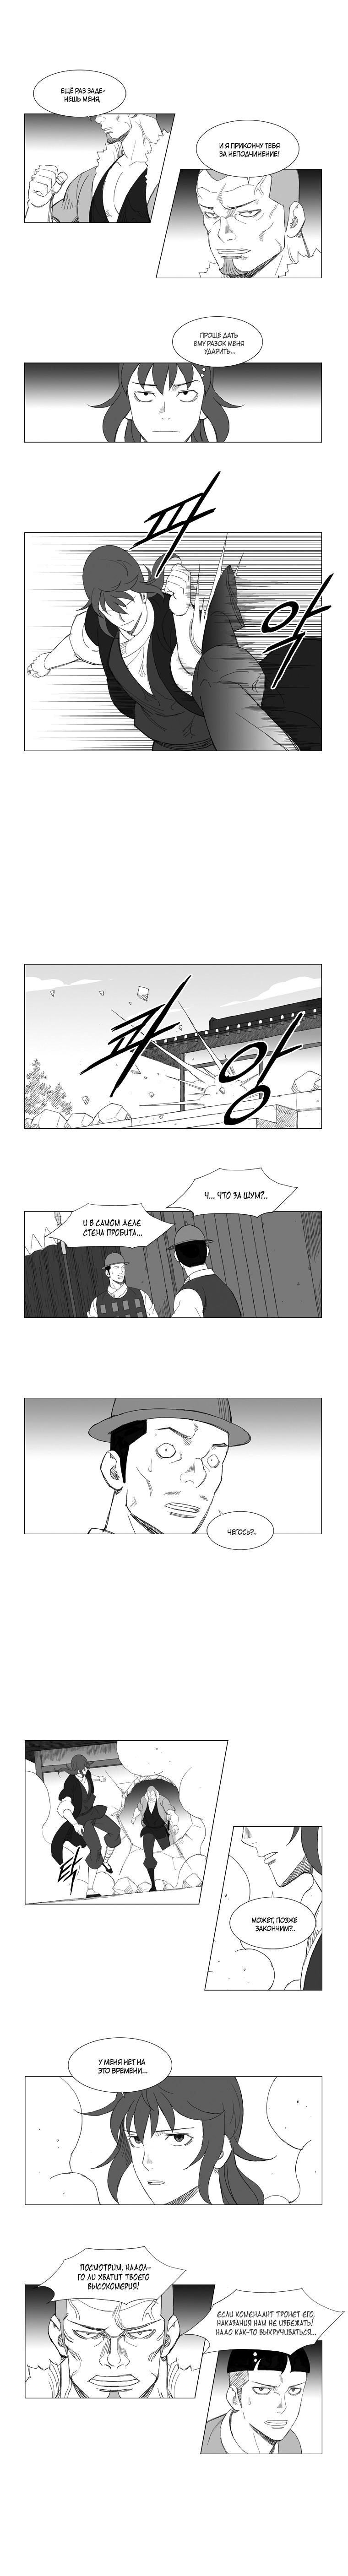 https://r1.ninemanga.com/comics/pic2/39/28263/416252/1532707584401.jpg Page 3